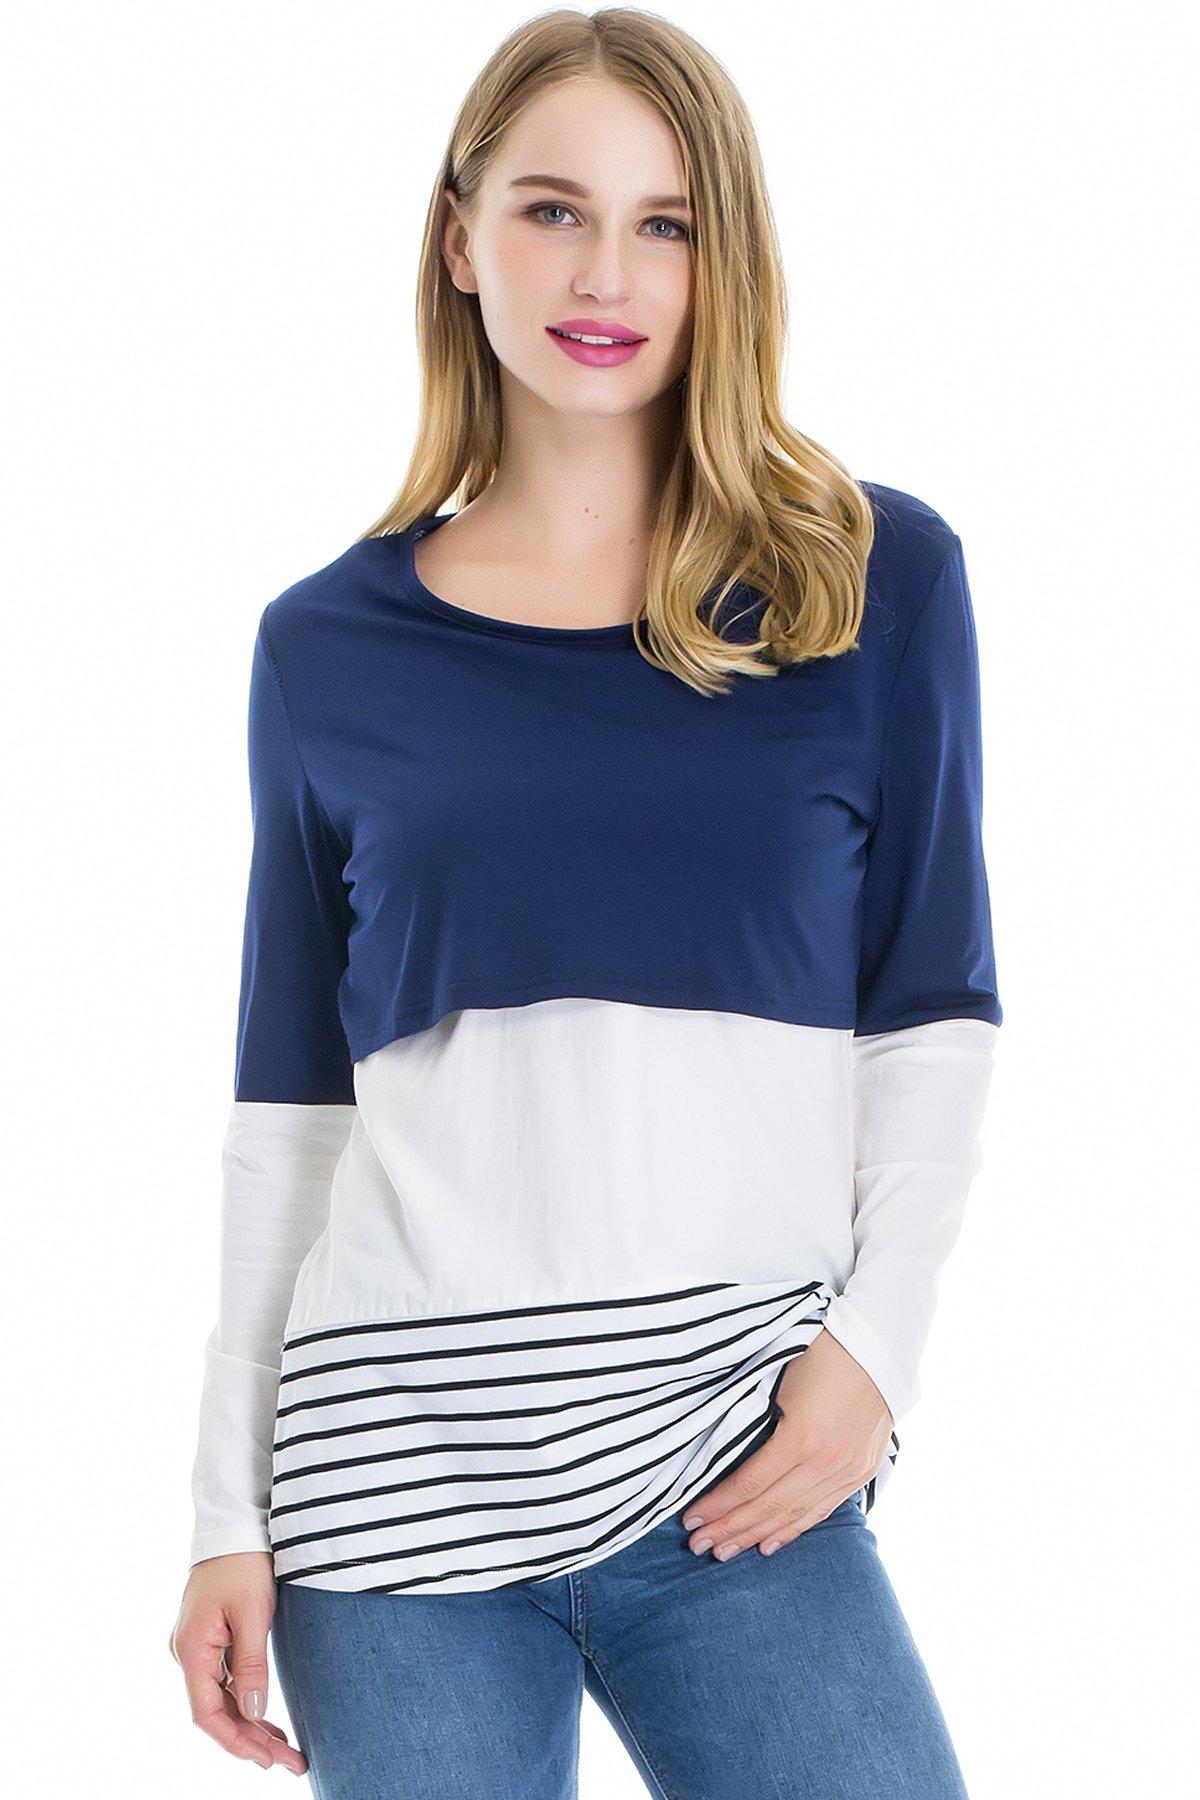 Smallshow Womens Long Sleeve Back Lace Maternity Nursing Tops Medium(170/88A) Blue